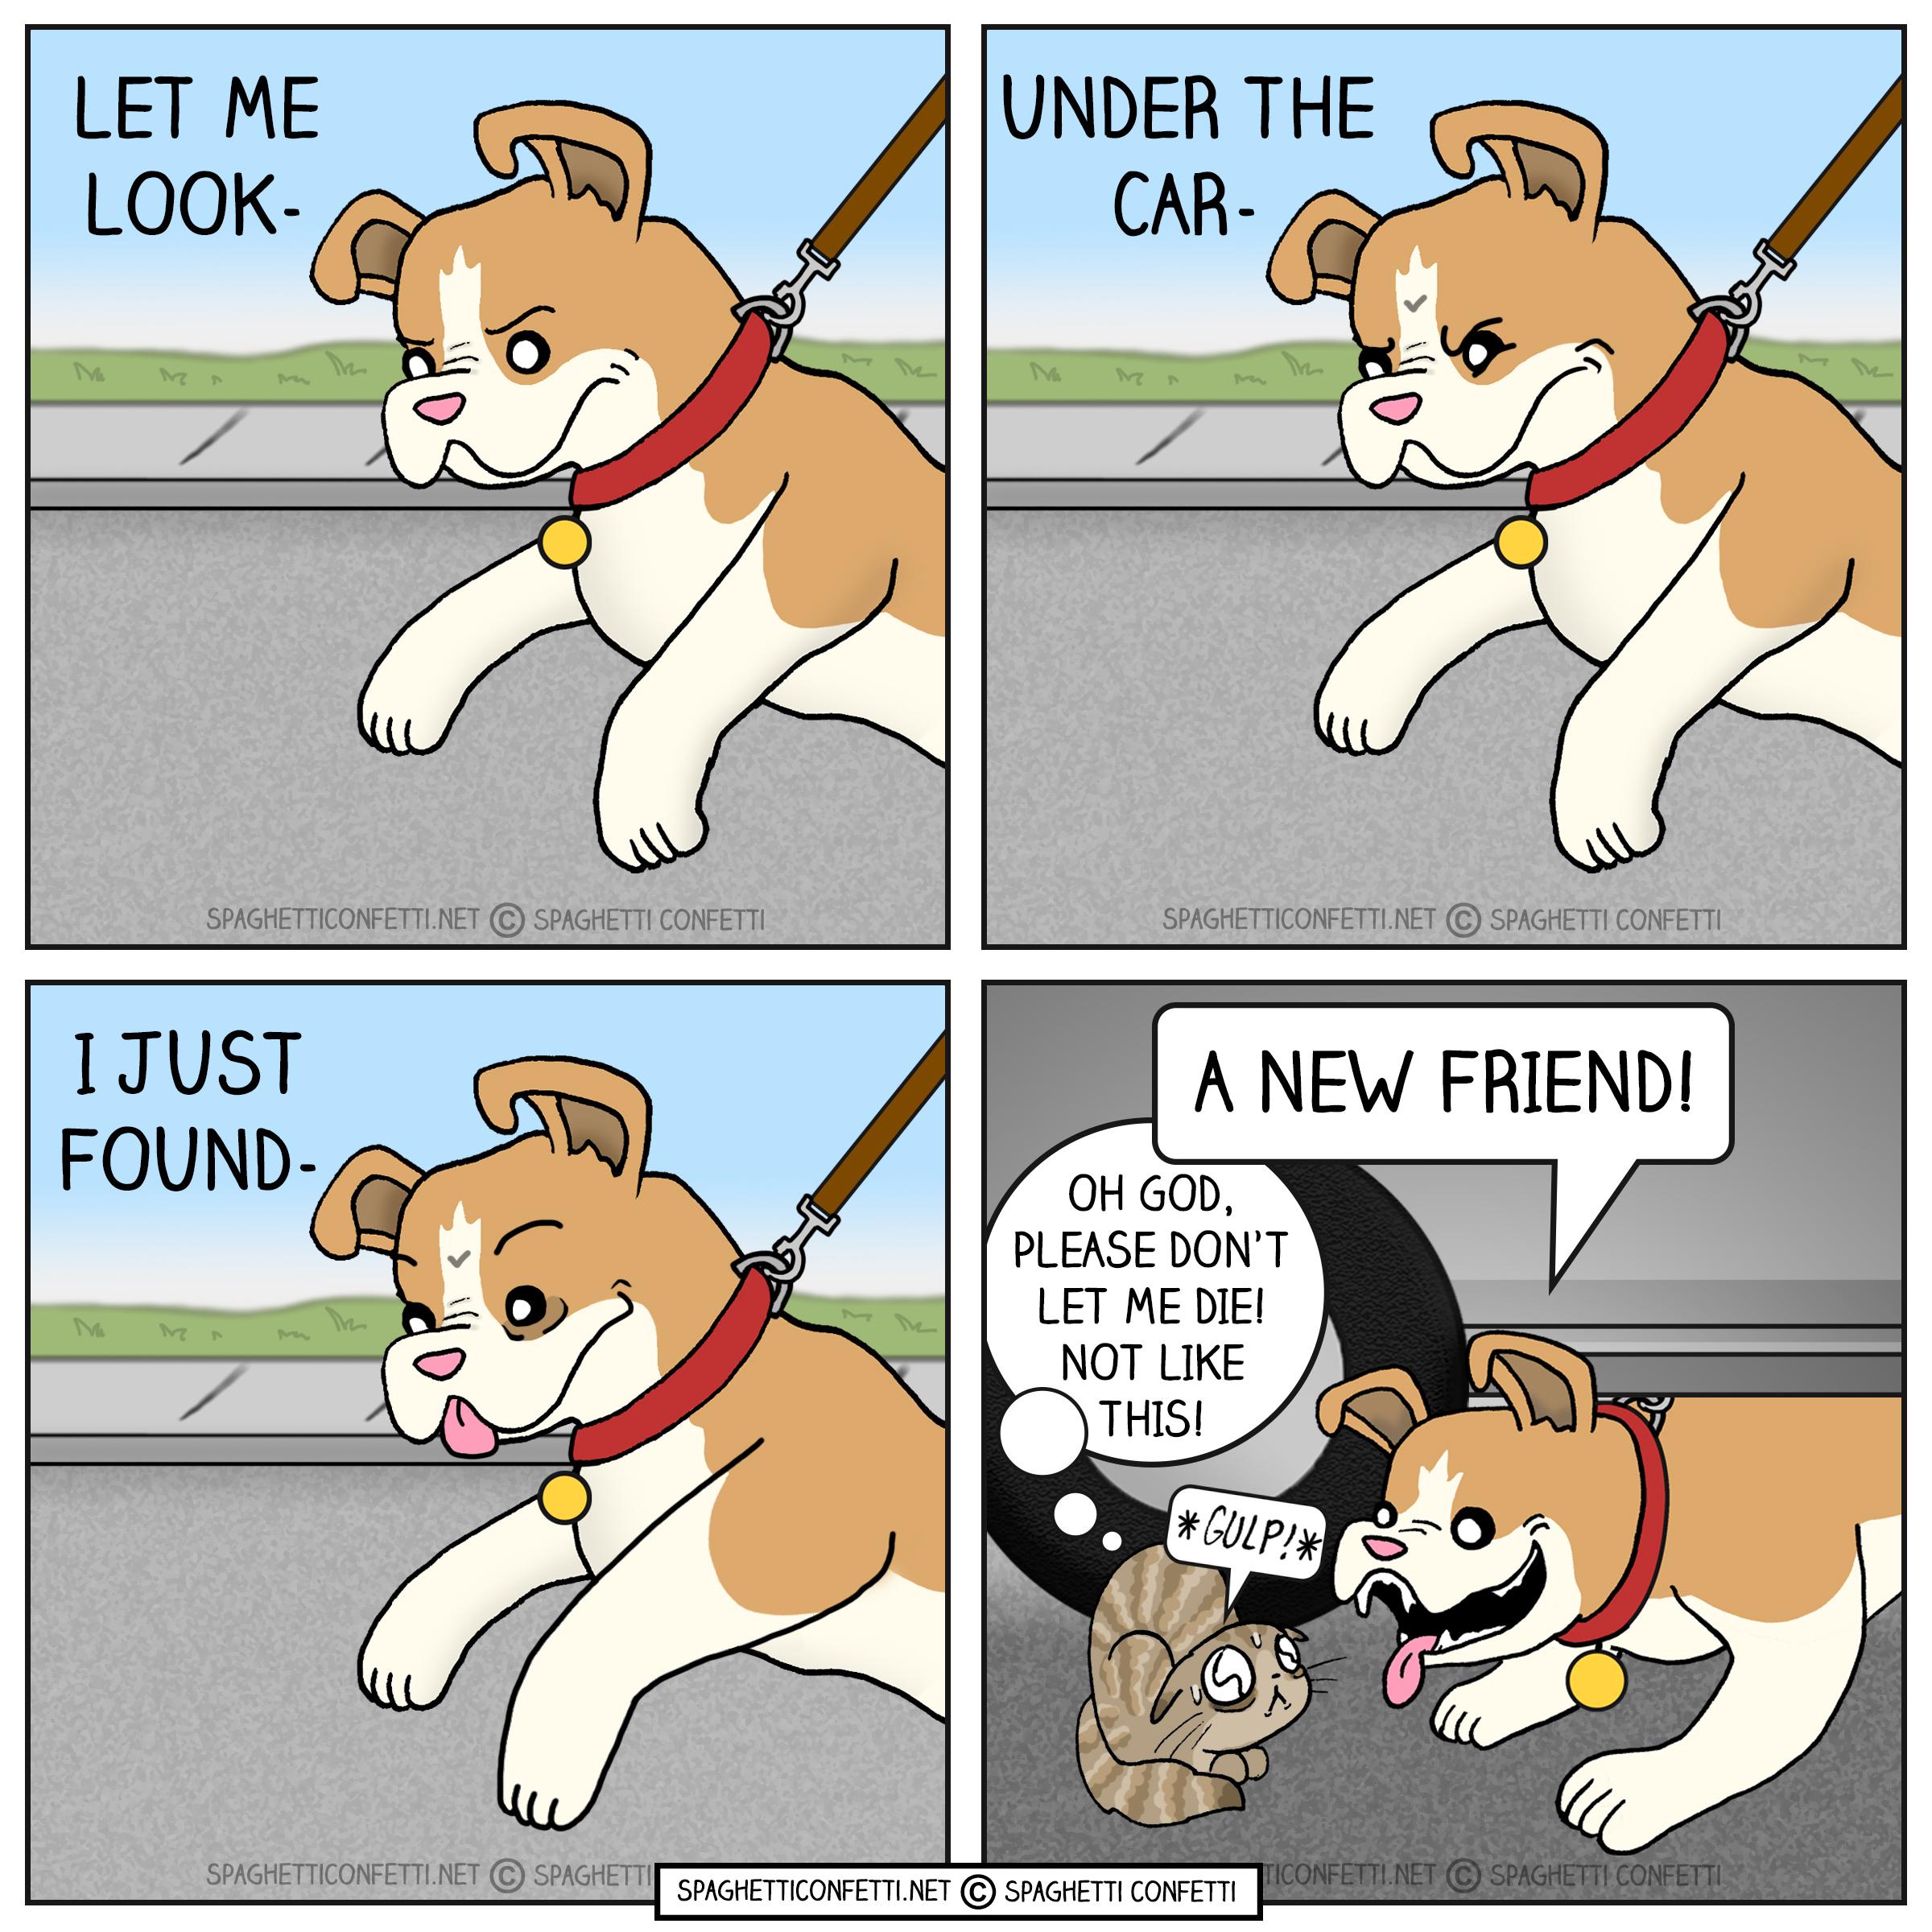 New Friend Comic 2020